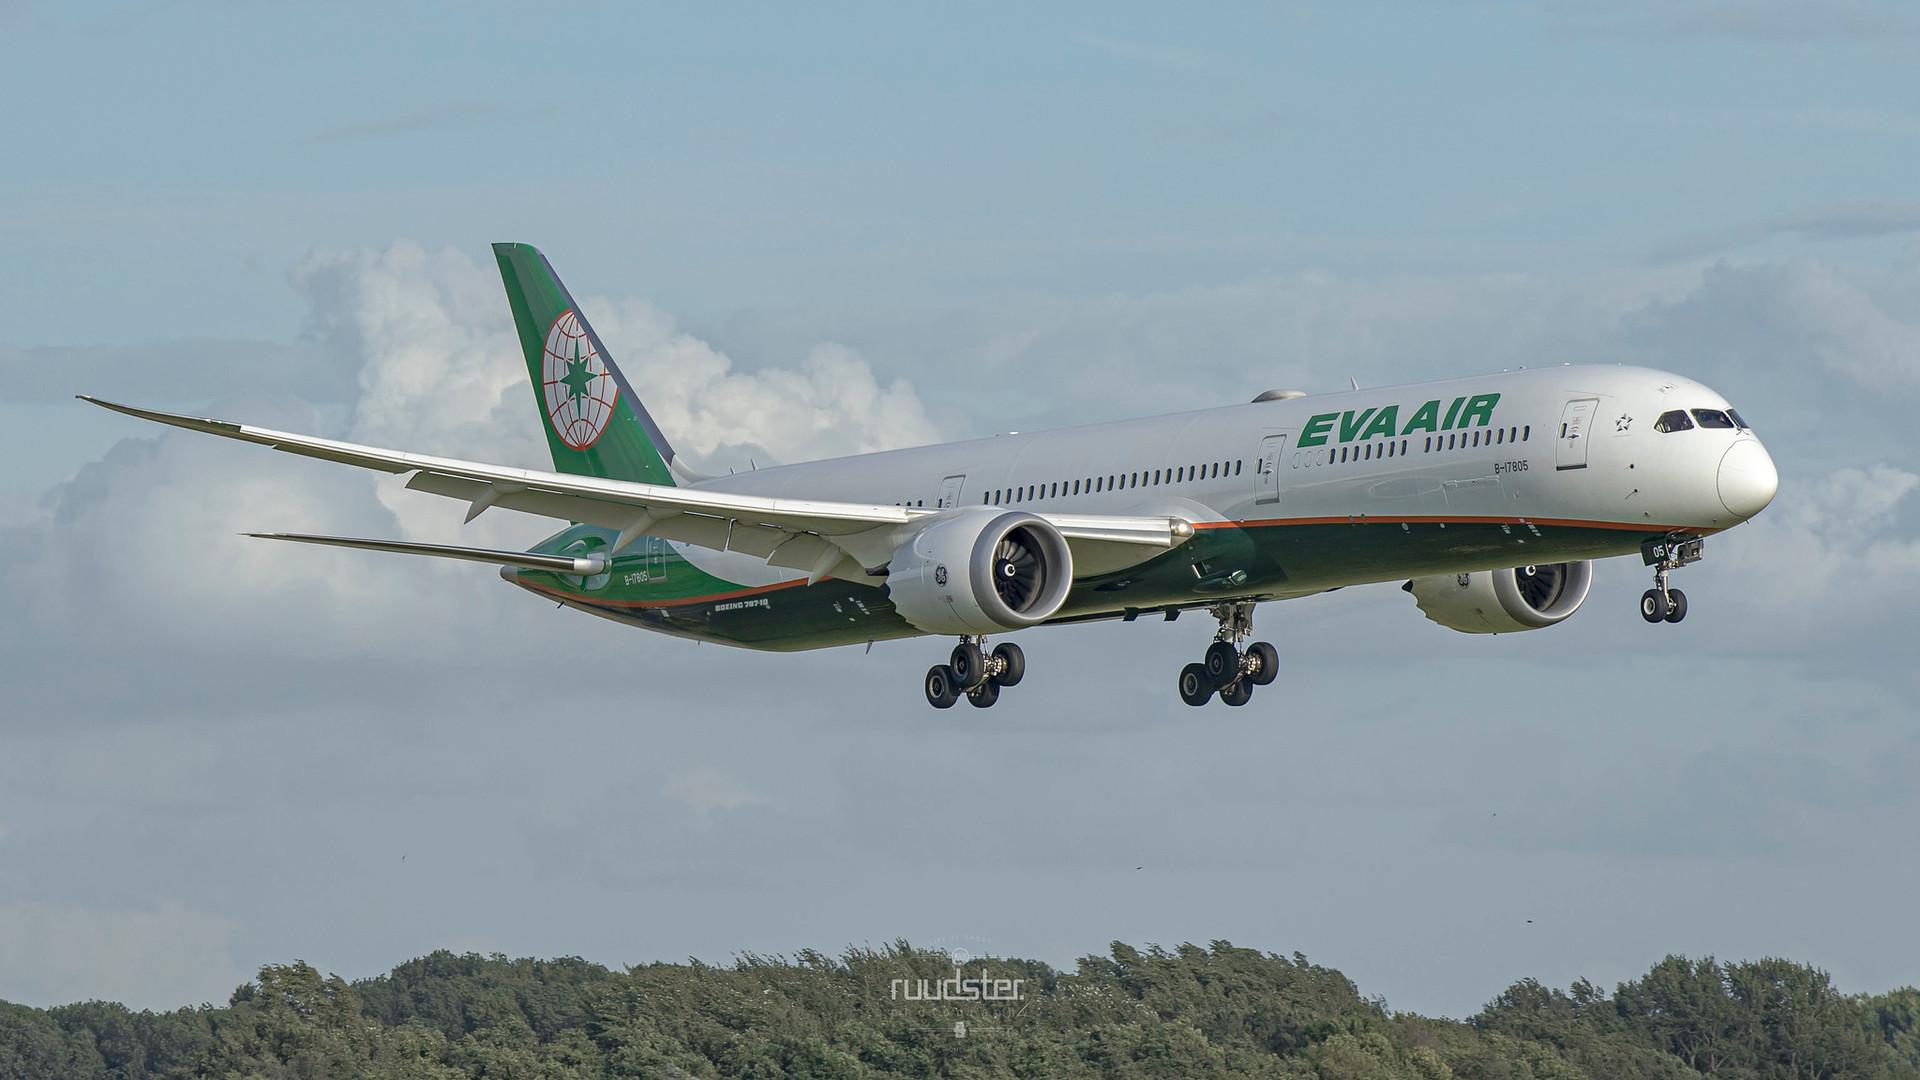 B-17805 | Build: 2019 - Boeing 787-10